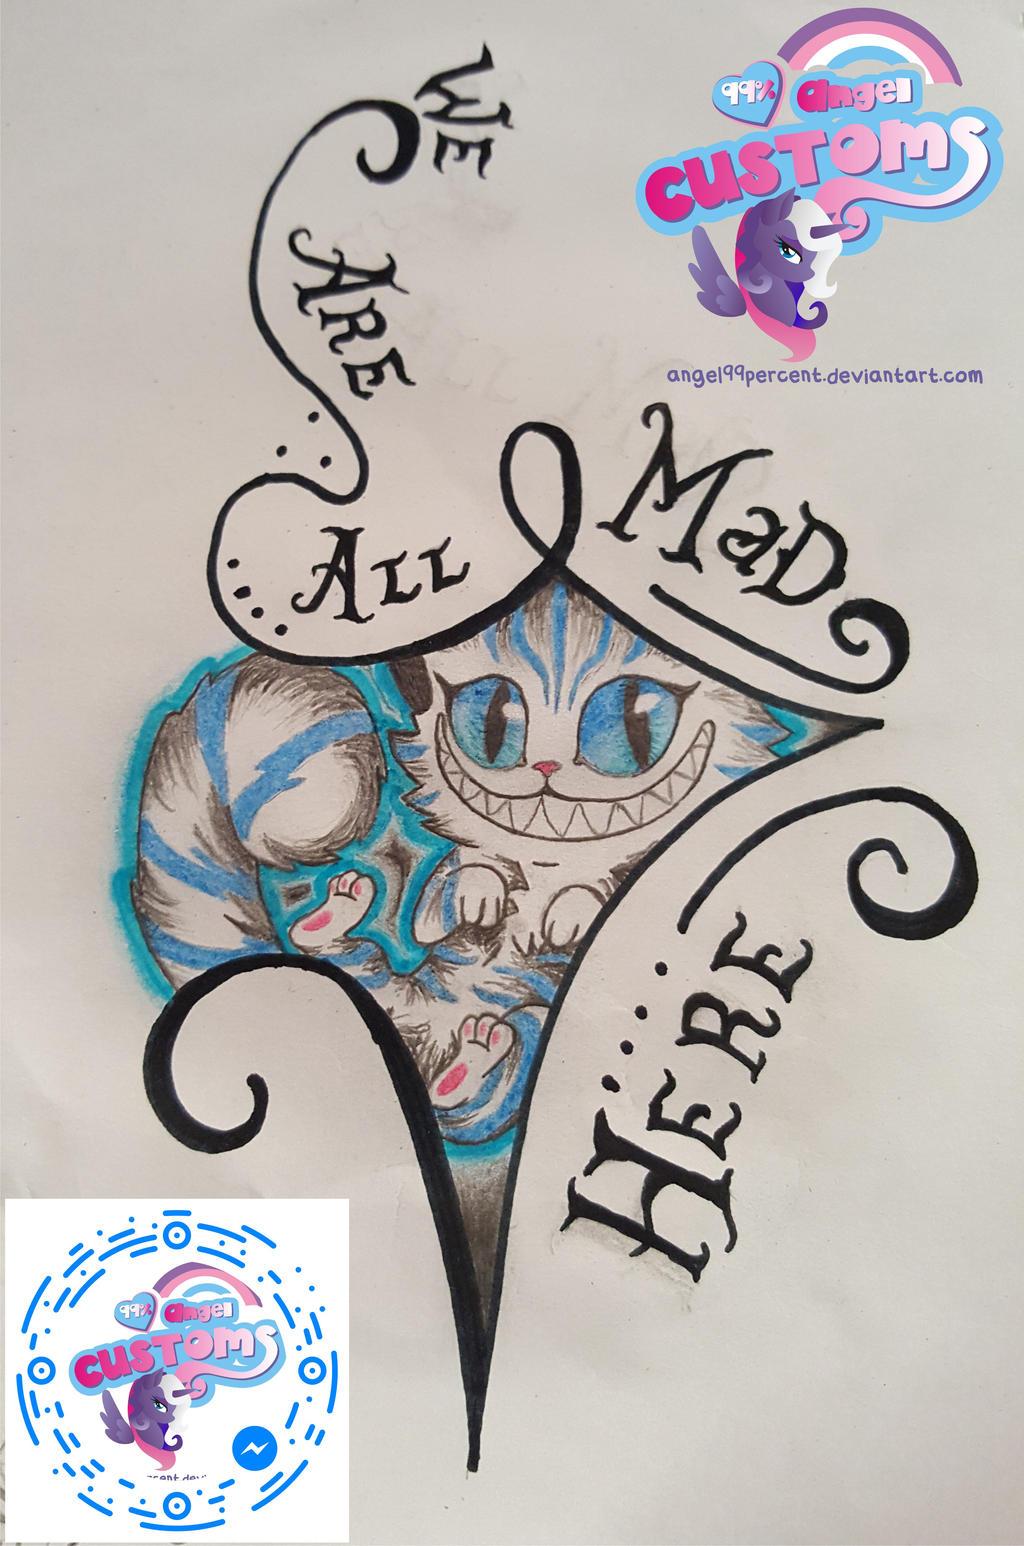 Cheshire cat tatoo project